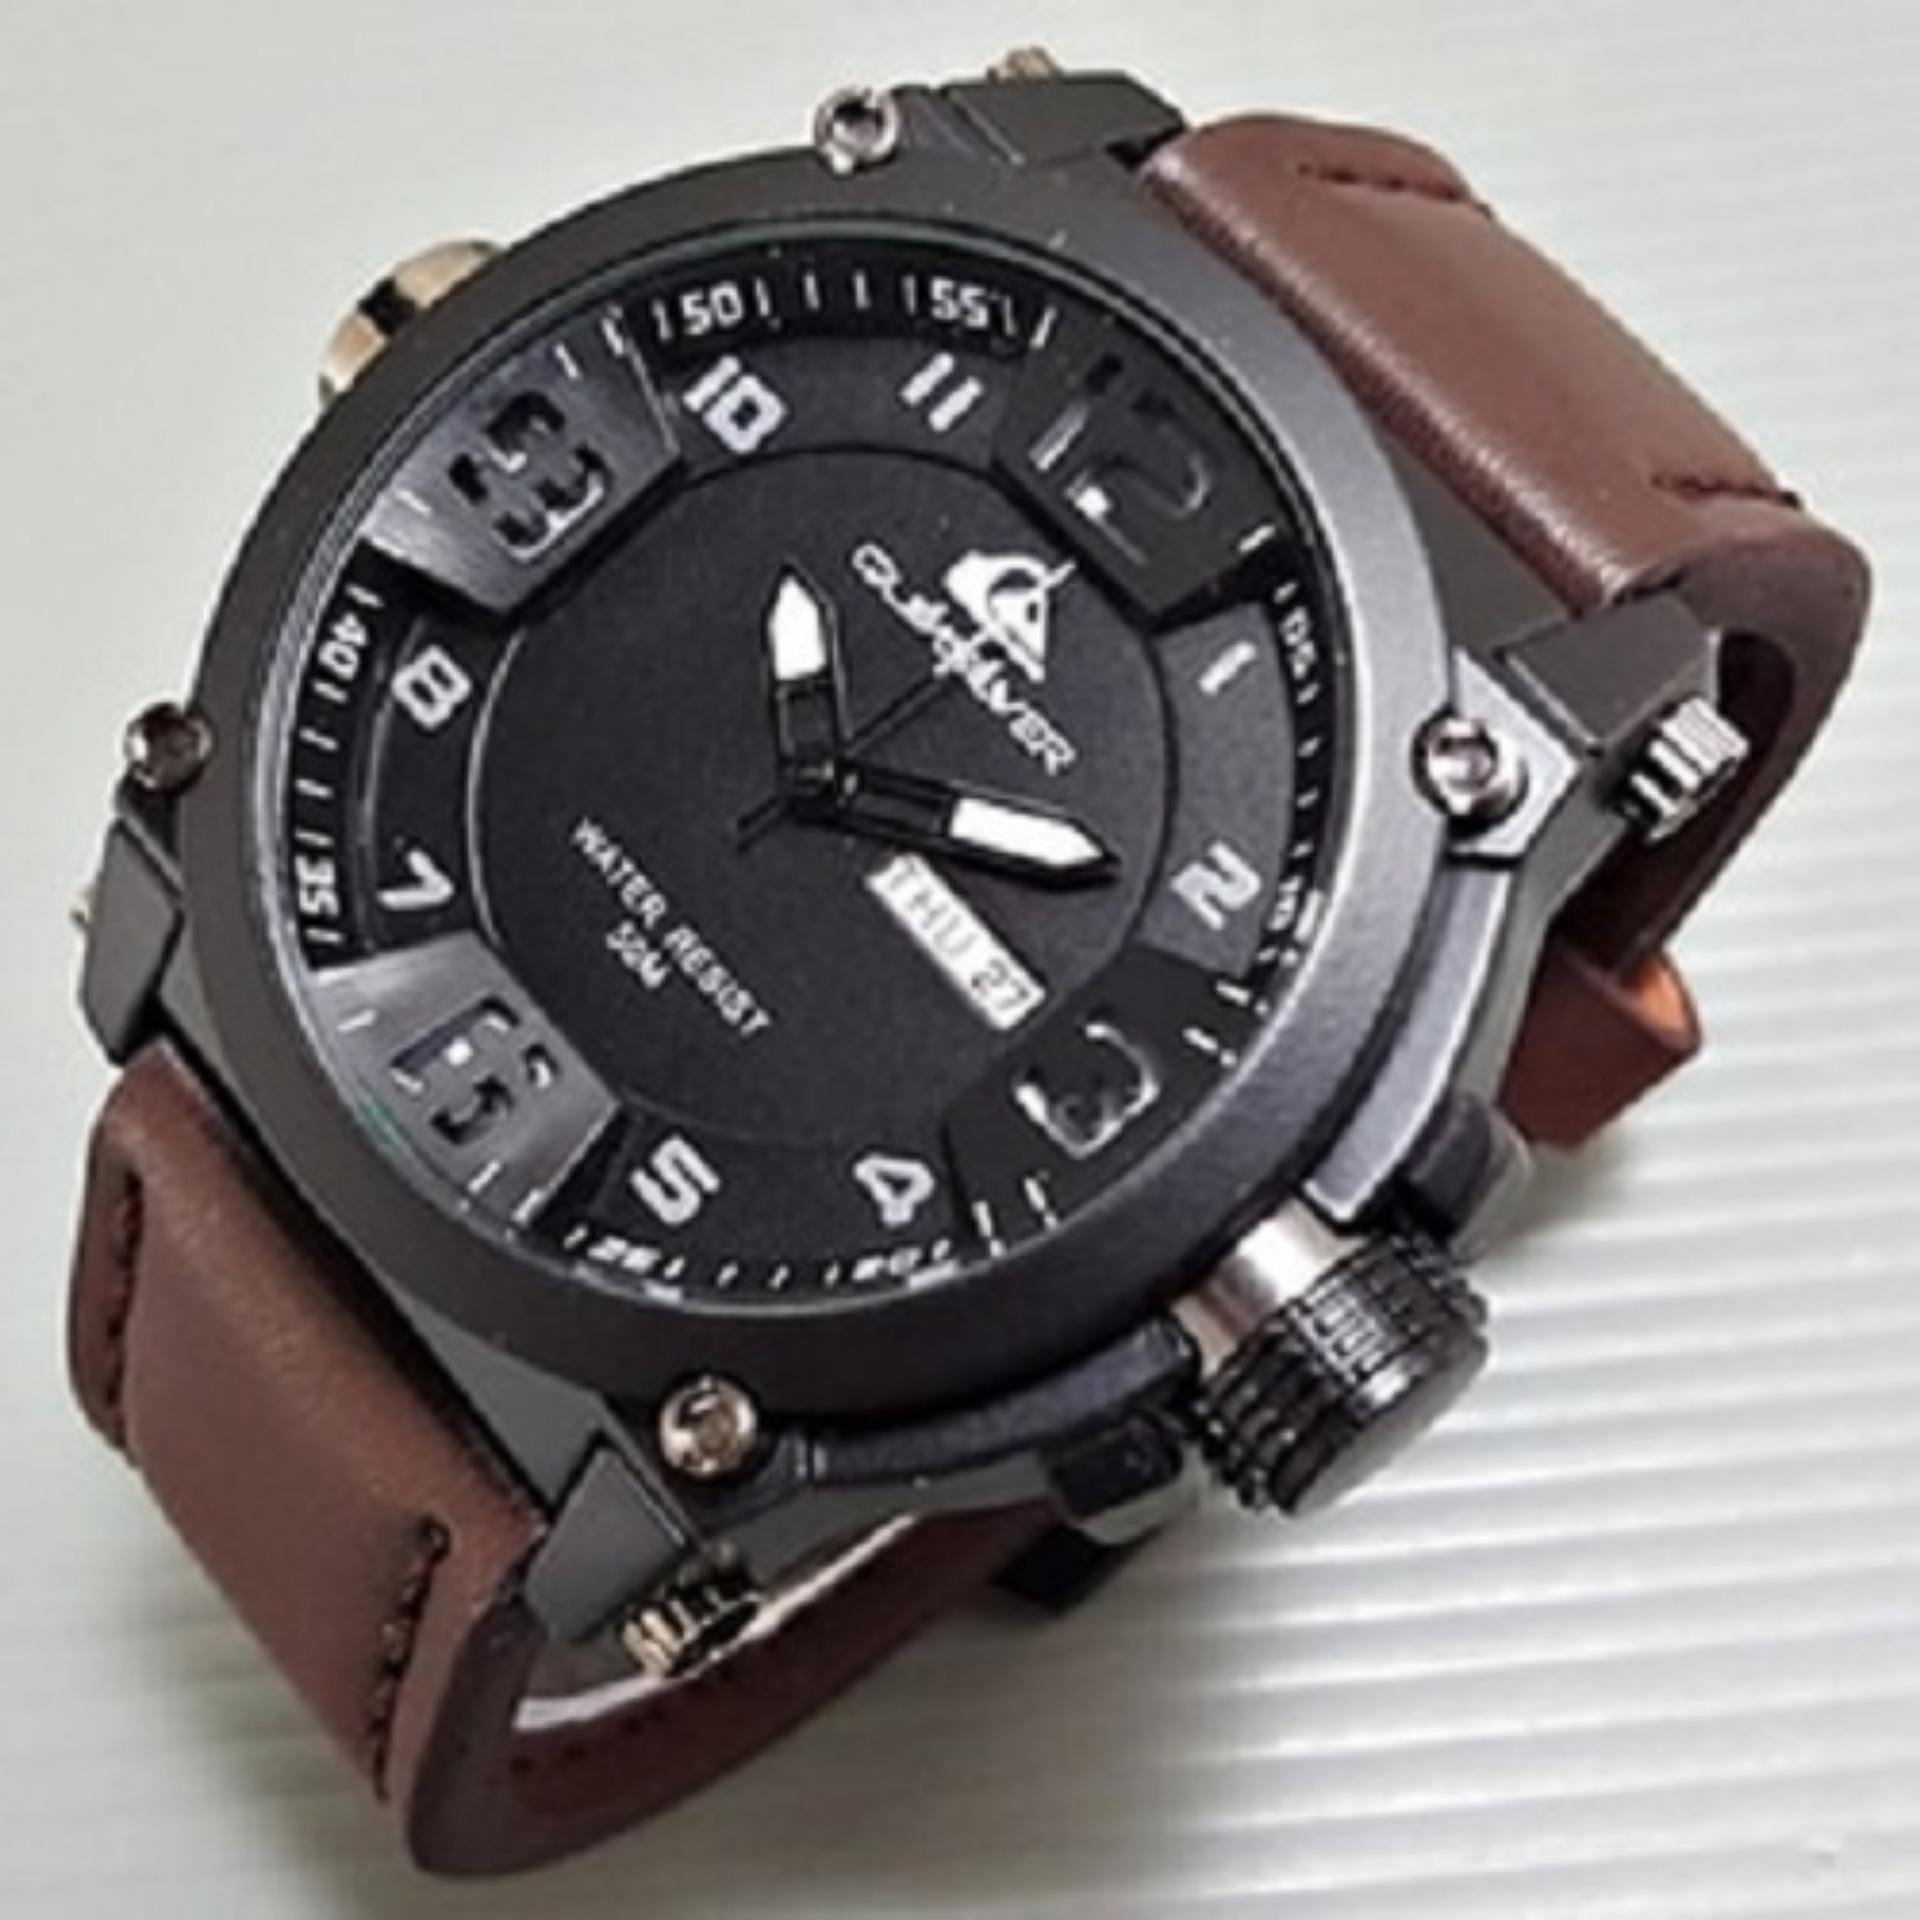 Swiss Army Jam Tangan Casual Pria Leather Strap SA5180 Chrono Detik Source · Gambar